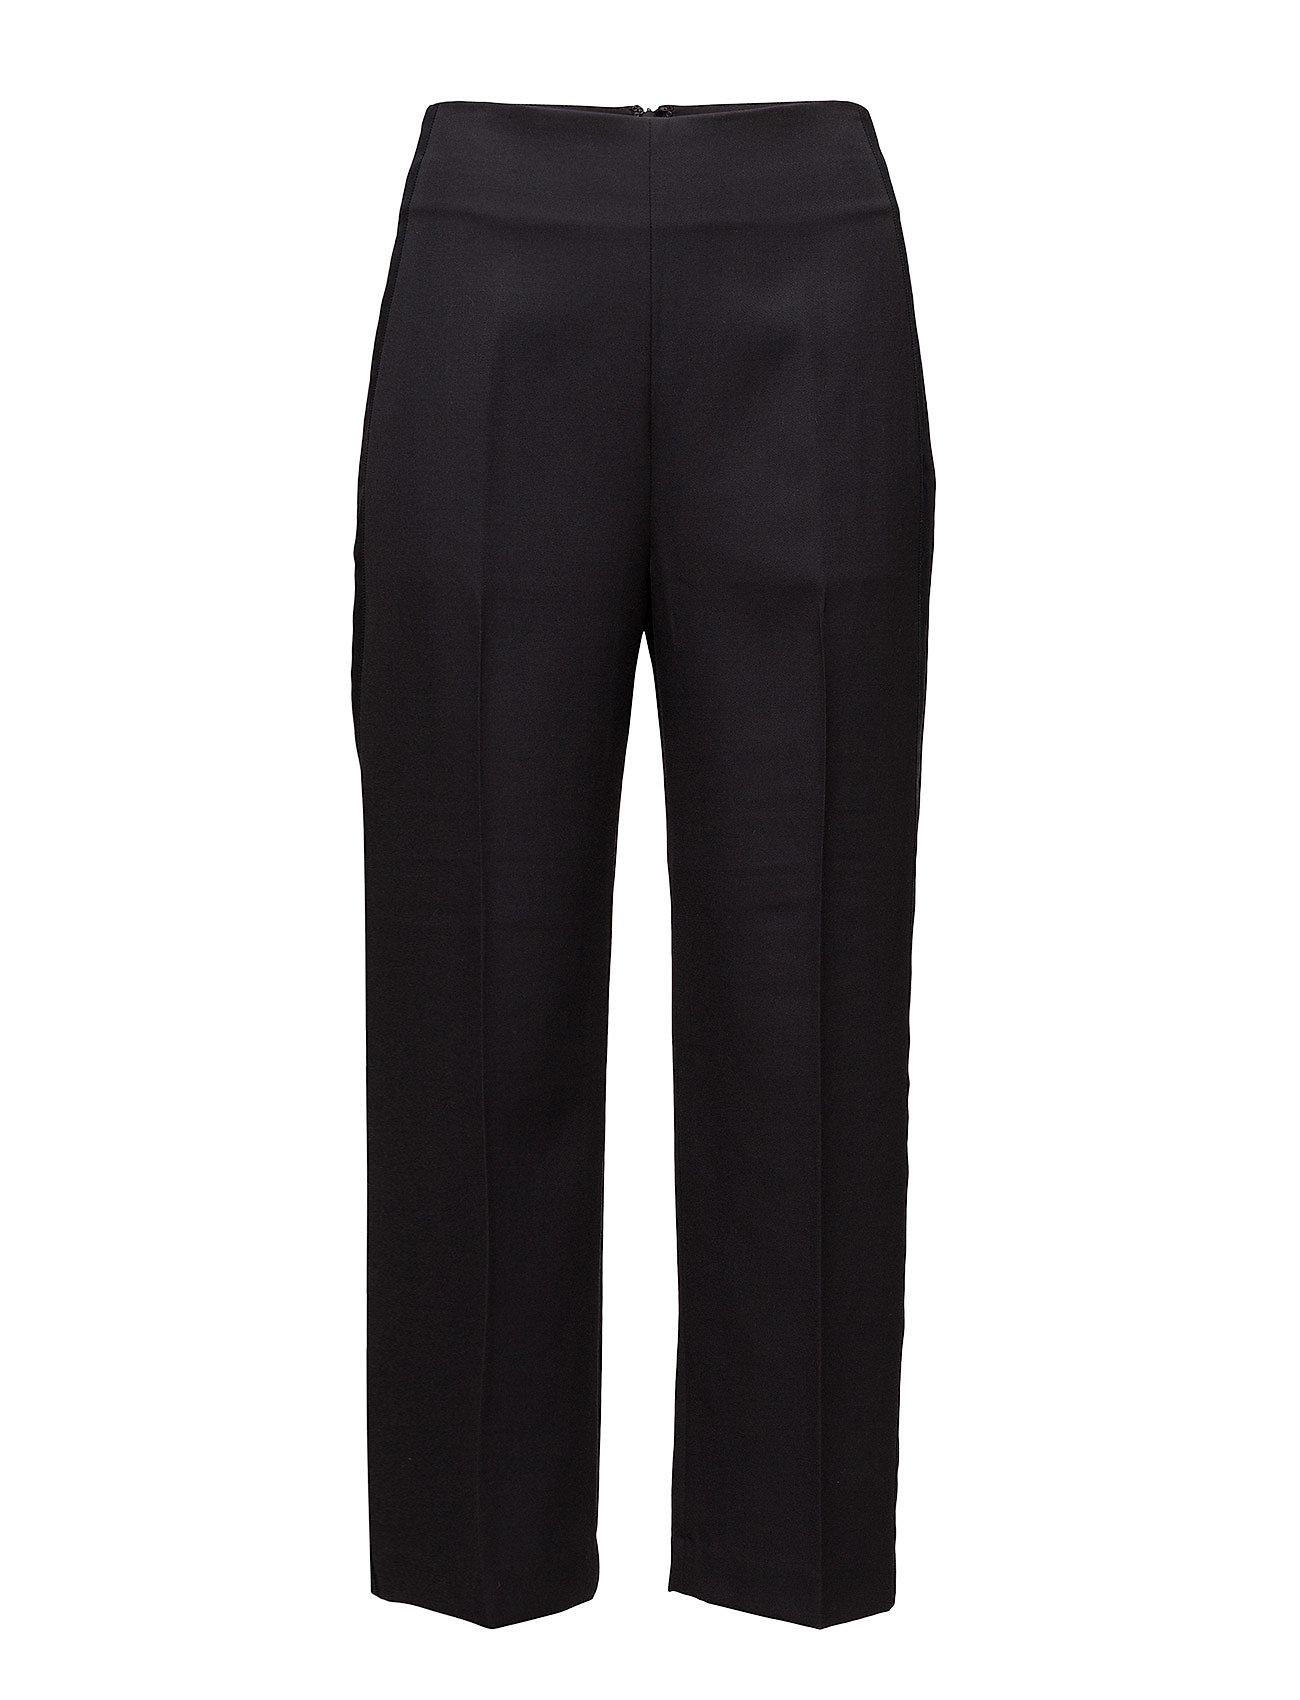 Image of Tailored Pant W Grosgrain Trim Bukser Med Lige Ben Sort 3.1 PHILLIP LIM (3026627581)